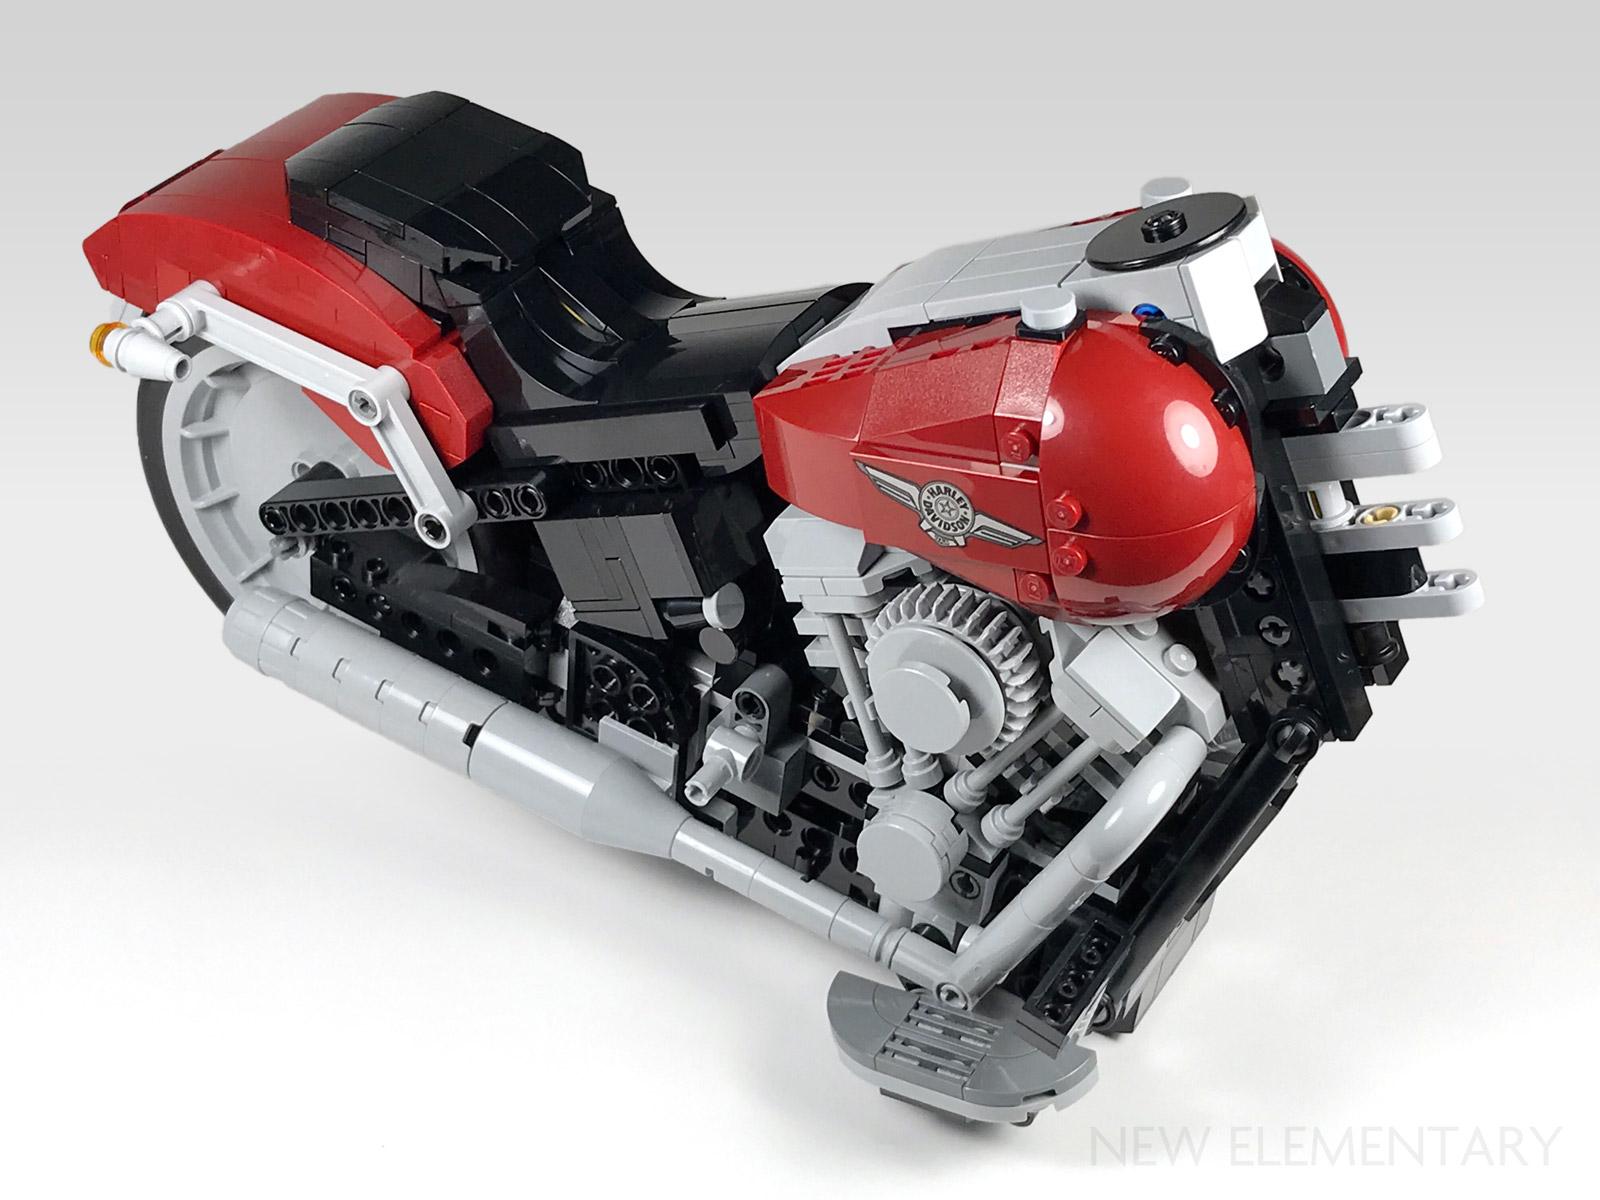 Harley Davidson: LEGO® Creator Expert Review: 10269 Harley-Davidson Fat Boy